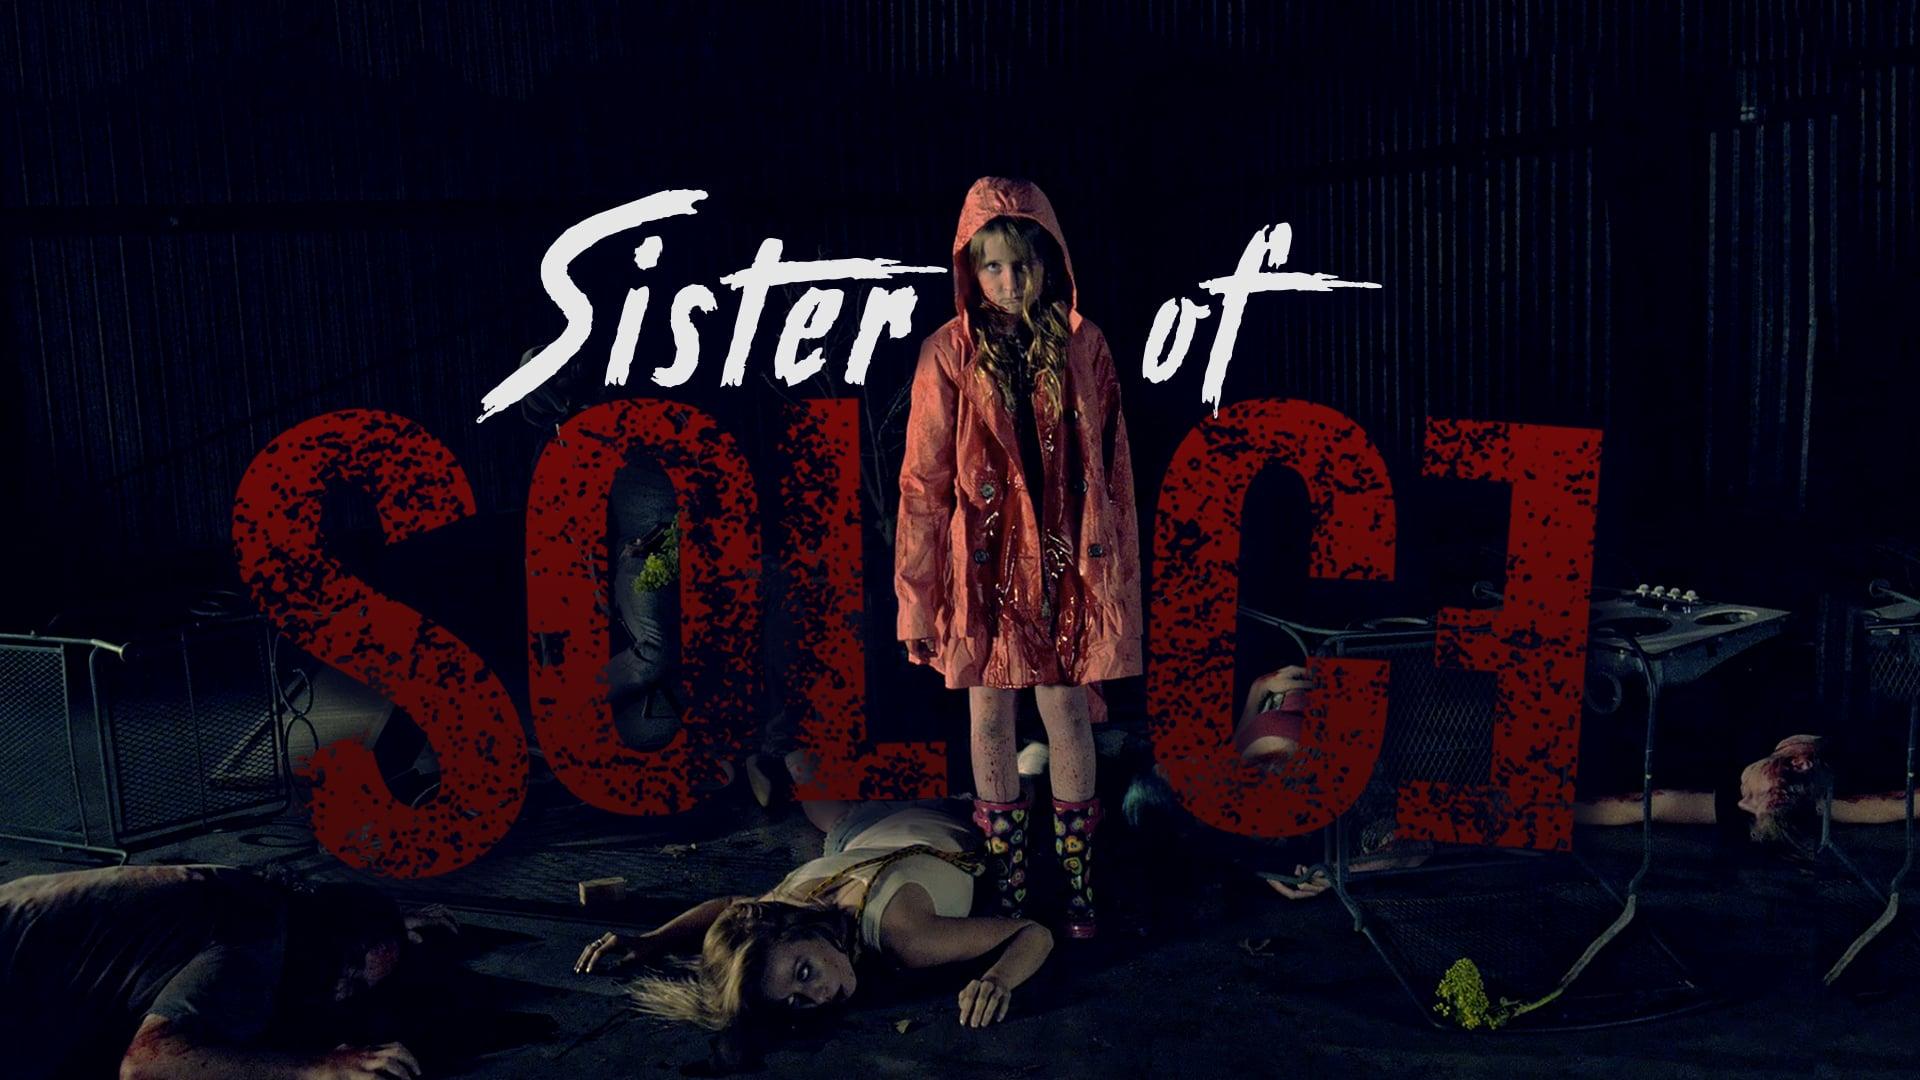 S.O.S. Pitch Trailer